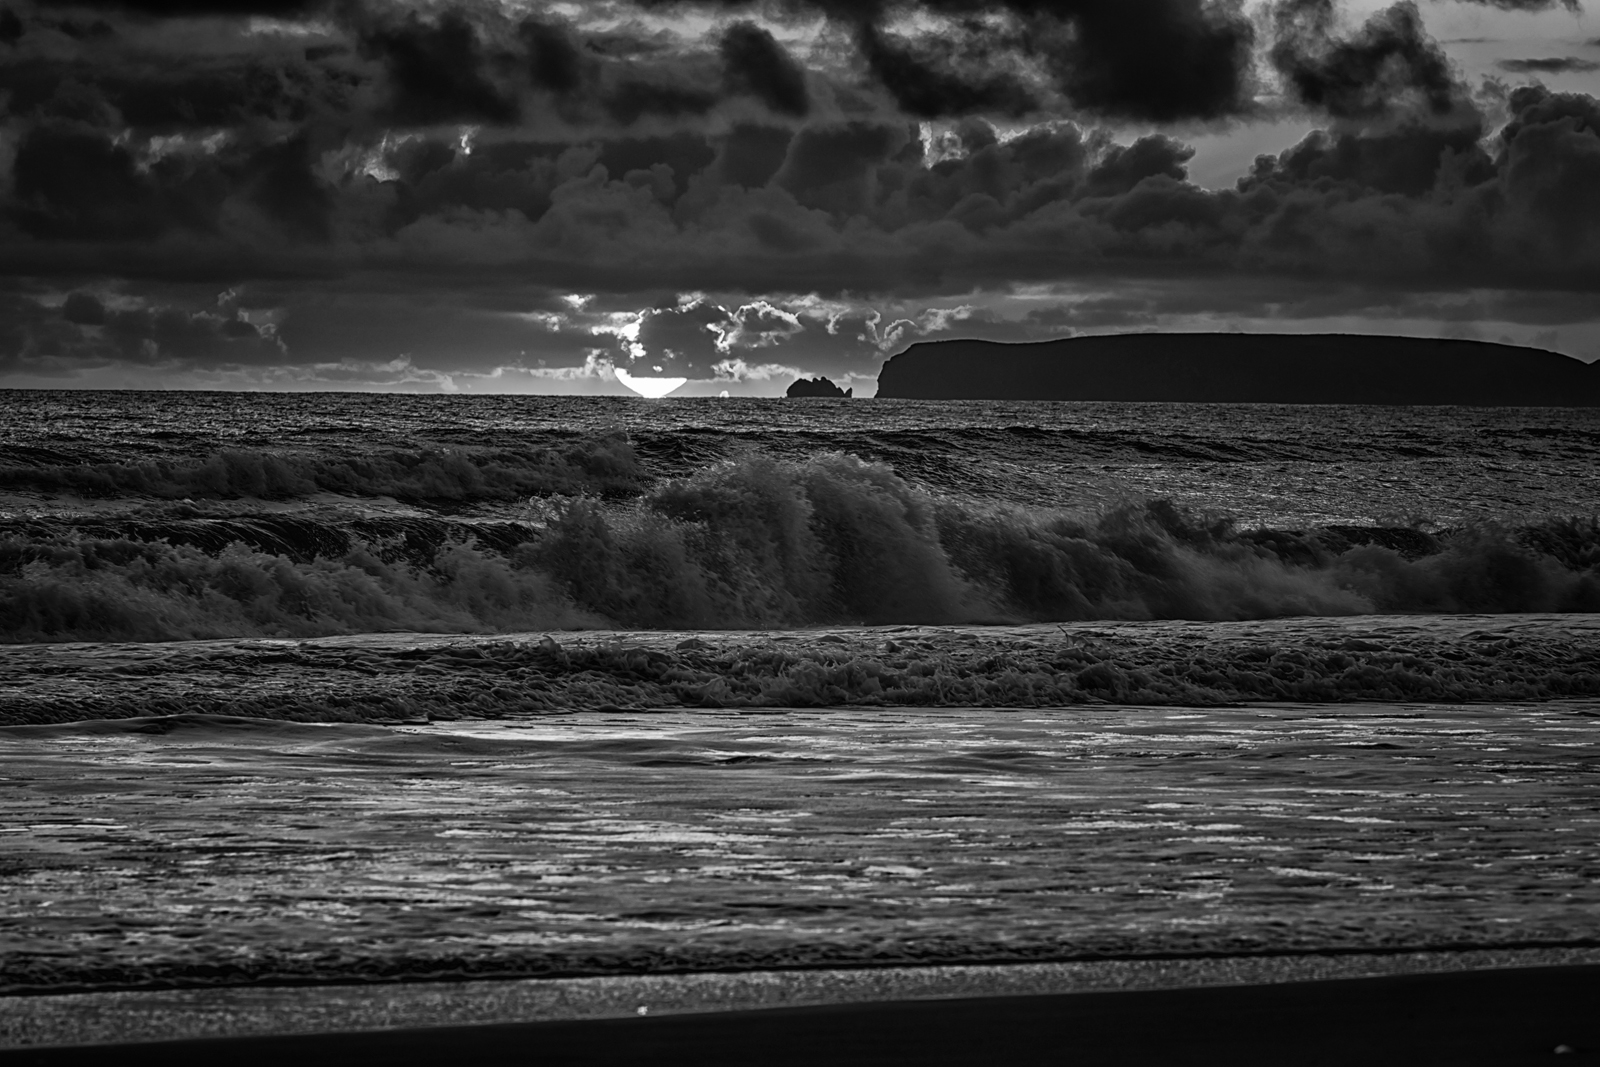 Sunset on Limantour Beach. Point Reyes National Seashore, CA